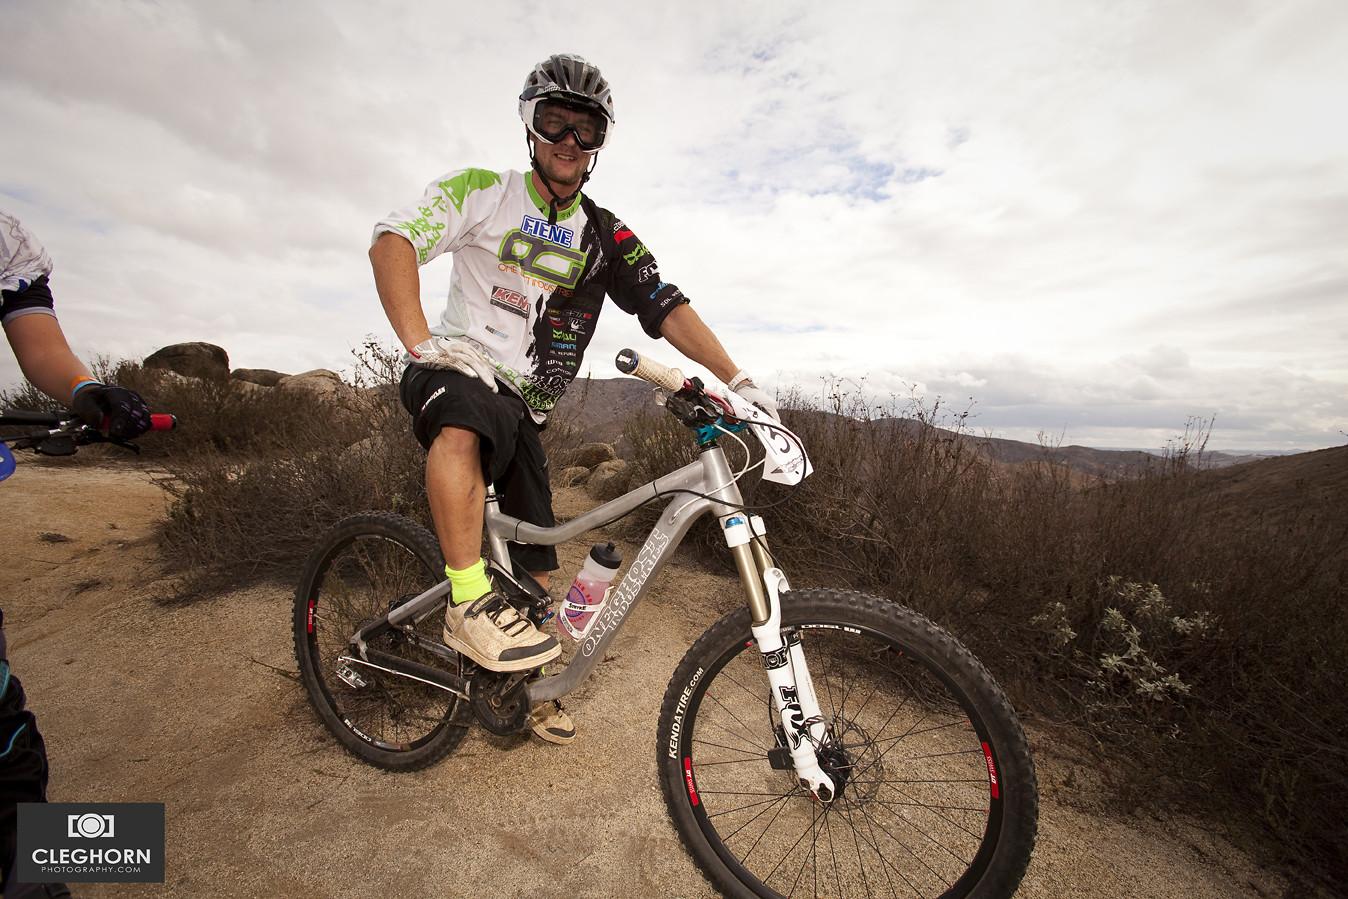 Chappy Fiene - Cleghorn Photography - Mountain Biking Pictures - Vital MTB